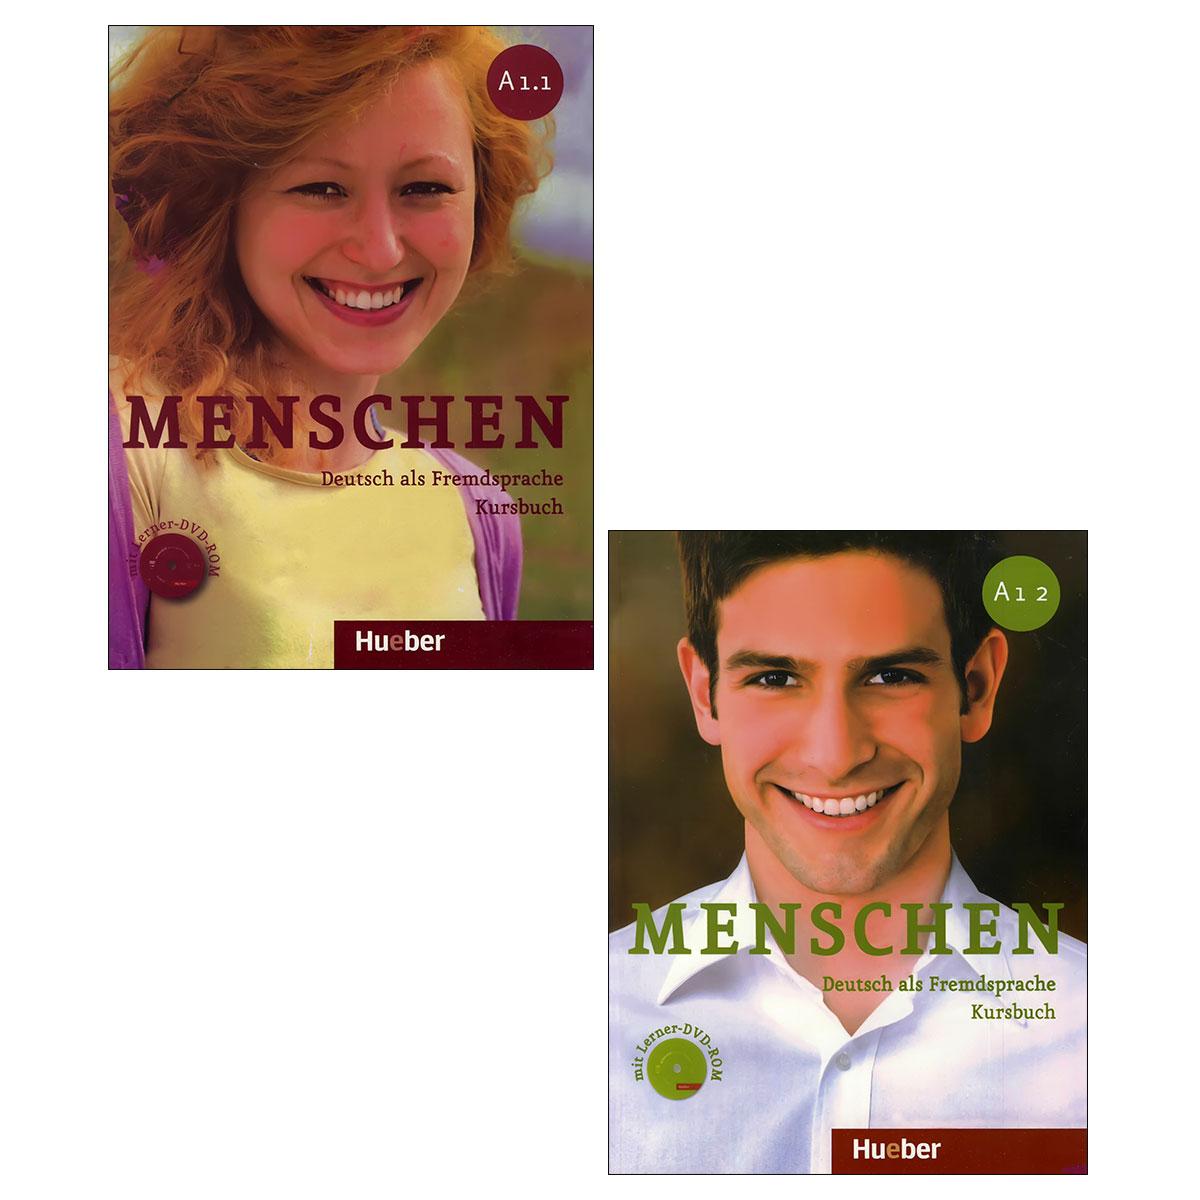 کتاب menschen A1 اثر Christoph Wortberg انتشارات زبان مهر 2 جلدی